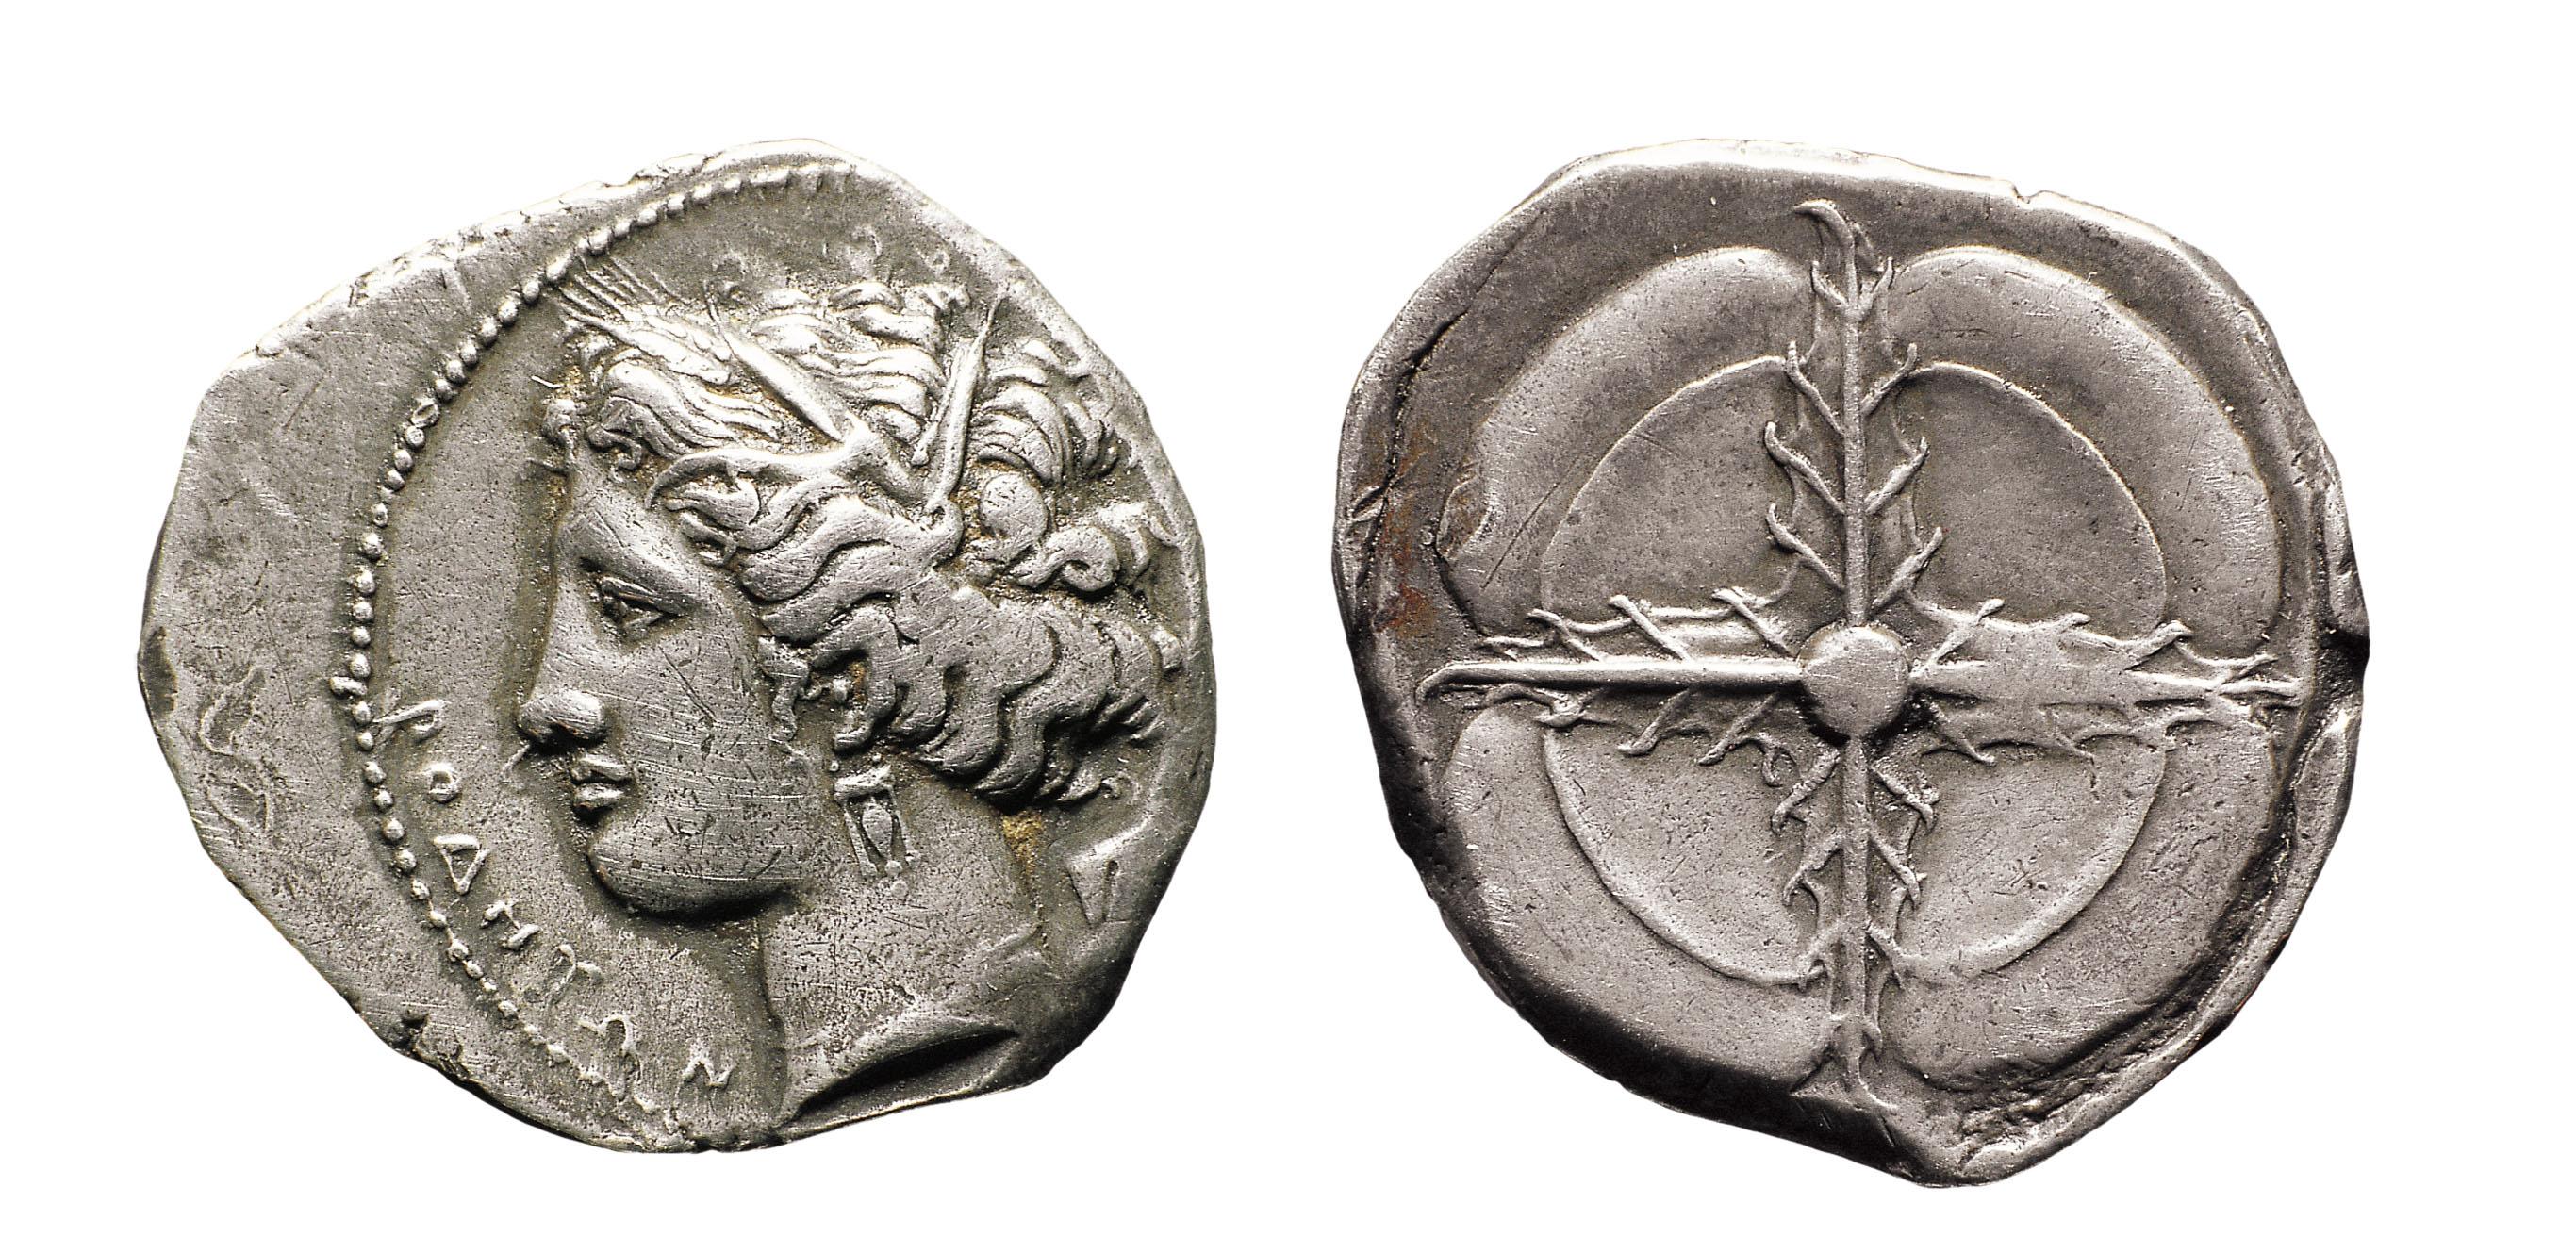 Rhode - Dracma de Rhode - Primer terç del segle III aC